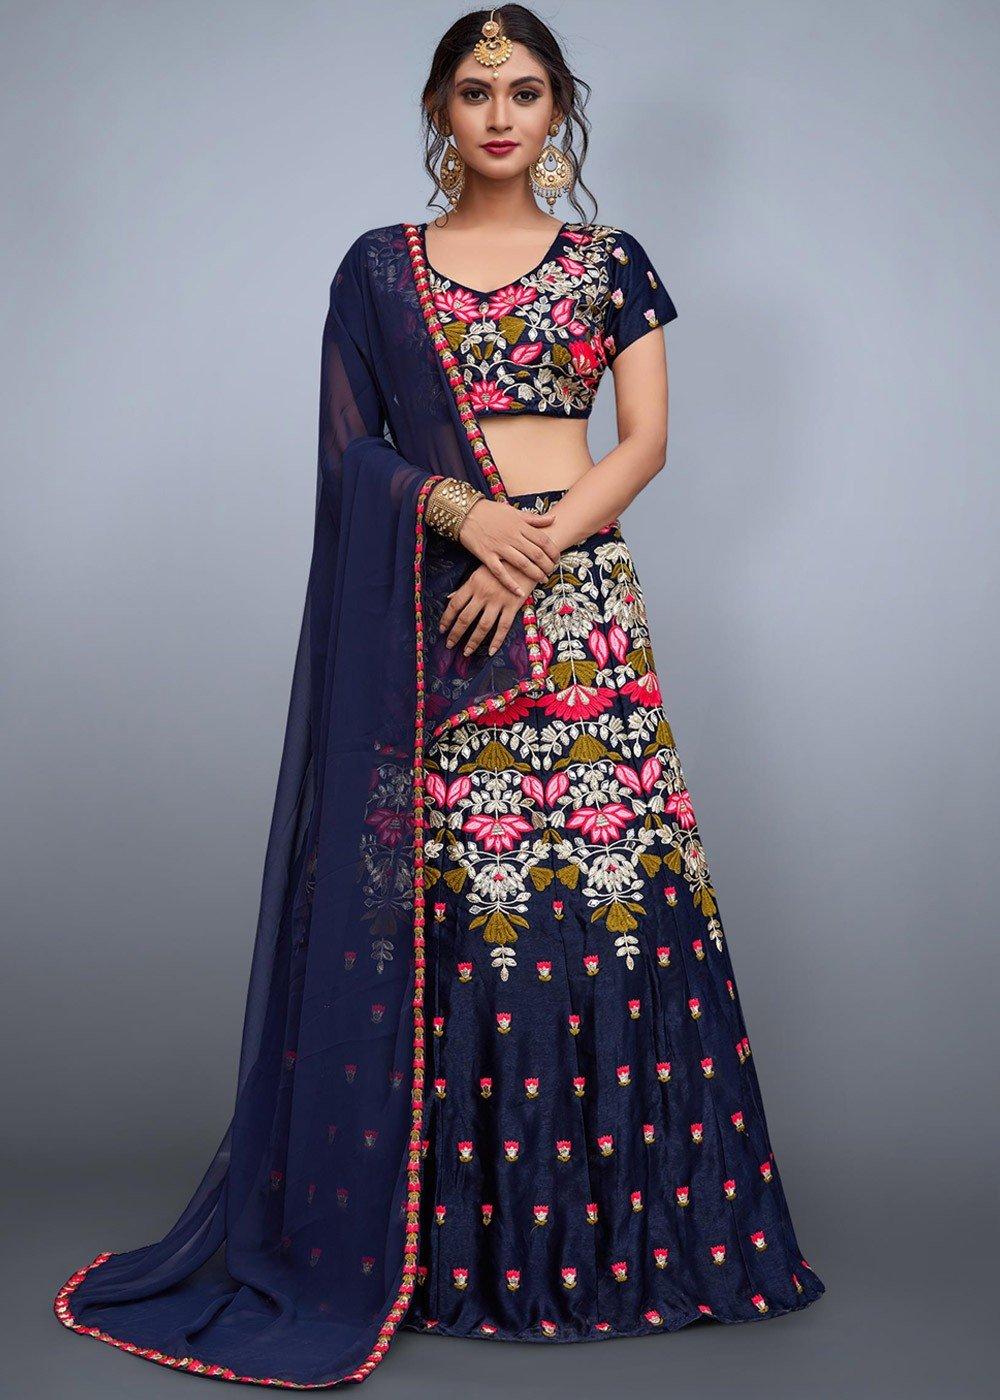 b9400d26fa6b0 Navy Blue Embroidered Art Silk Lehenga Choli Lehenga 1718LG03